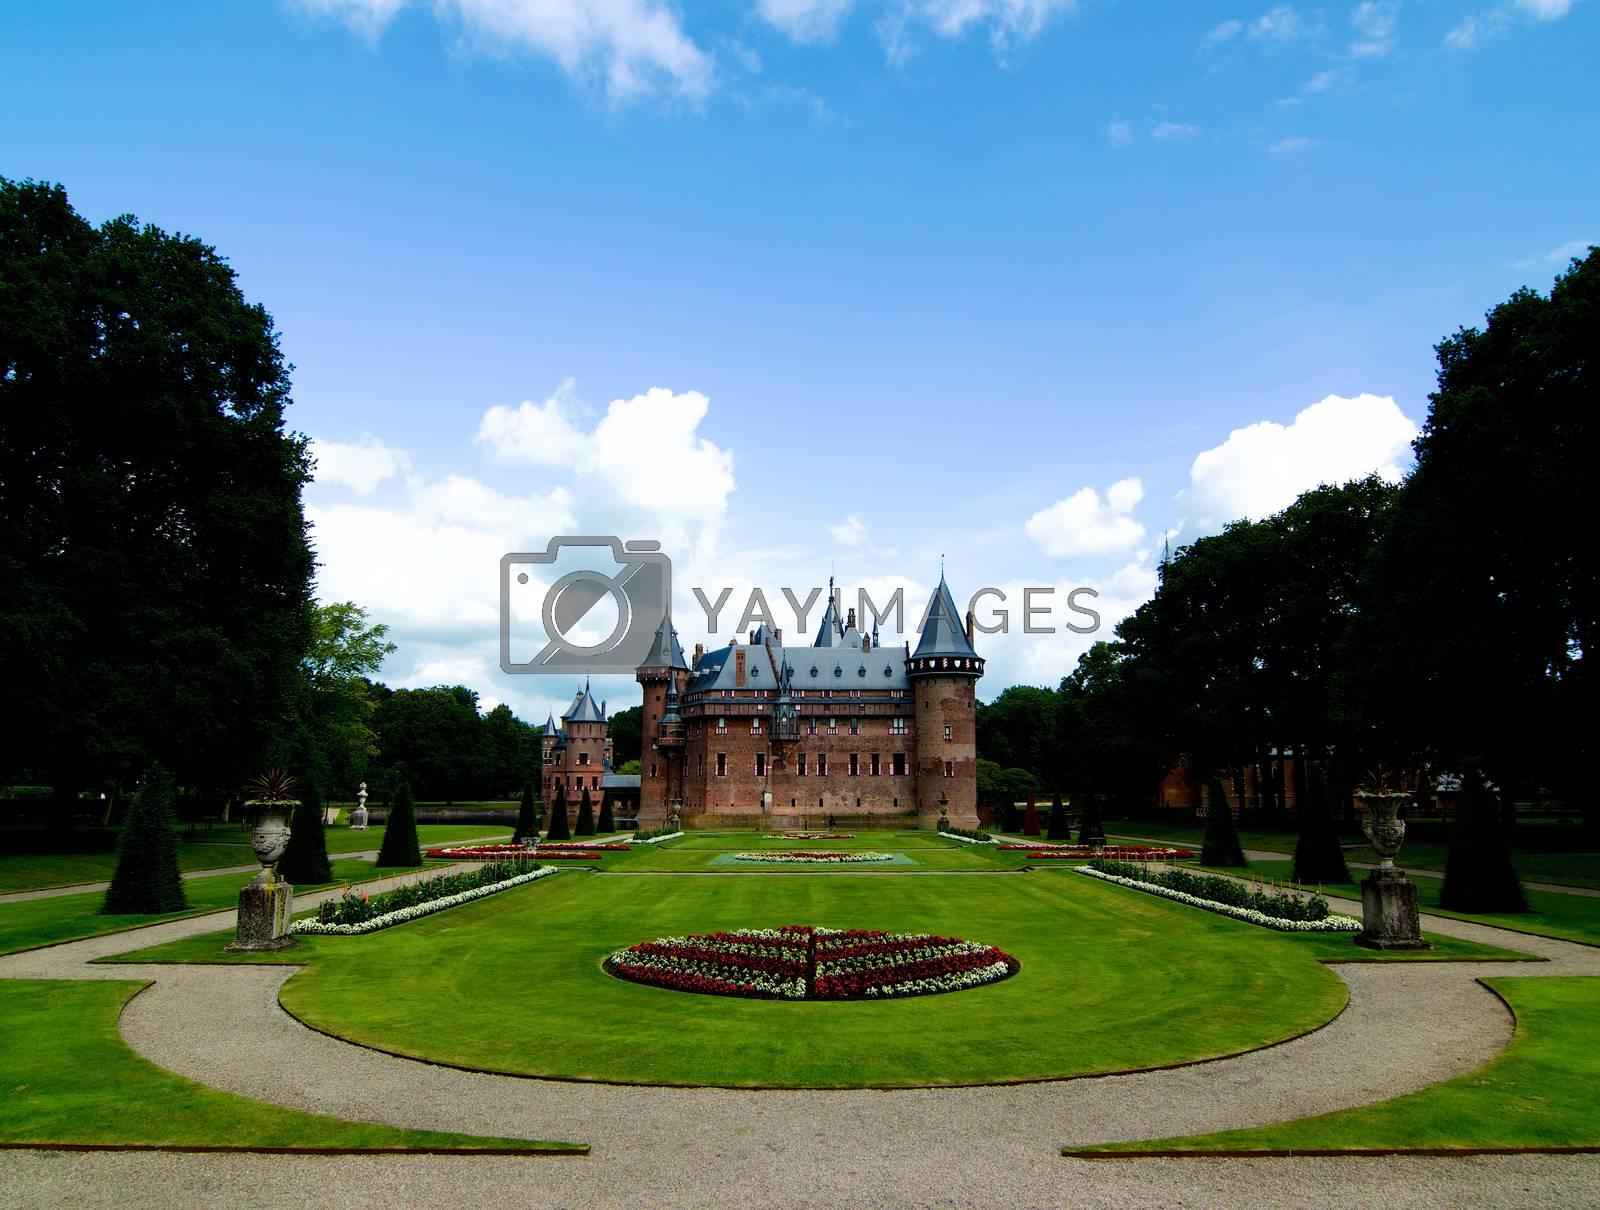 Medieval Castle De Haar from side of Flower Garden Alley against Blue Sky Outdoors. Utrecht, Netherlands